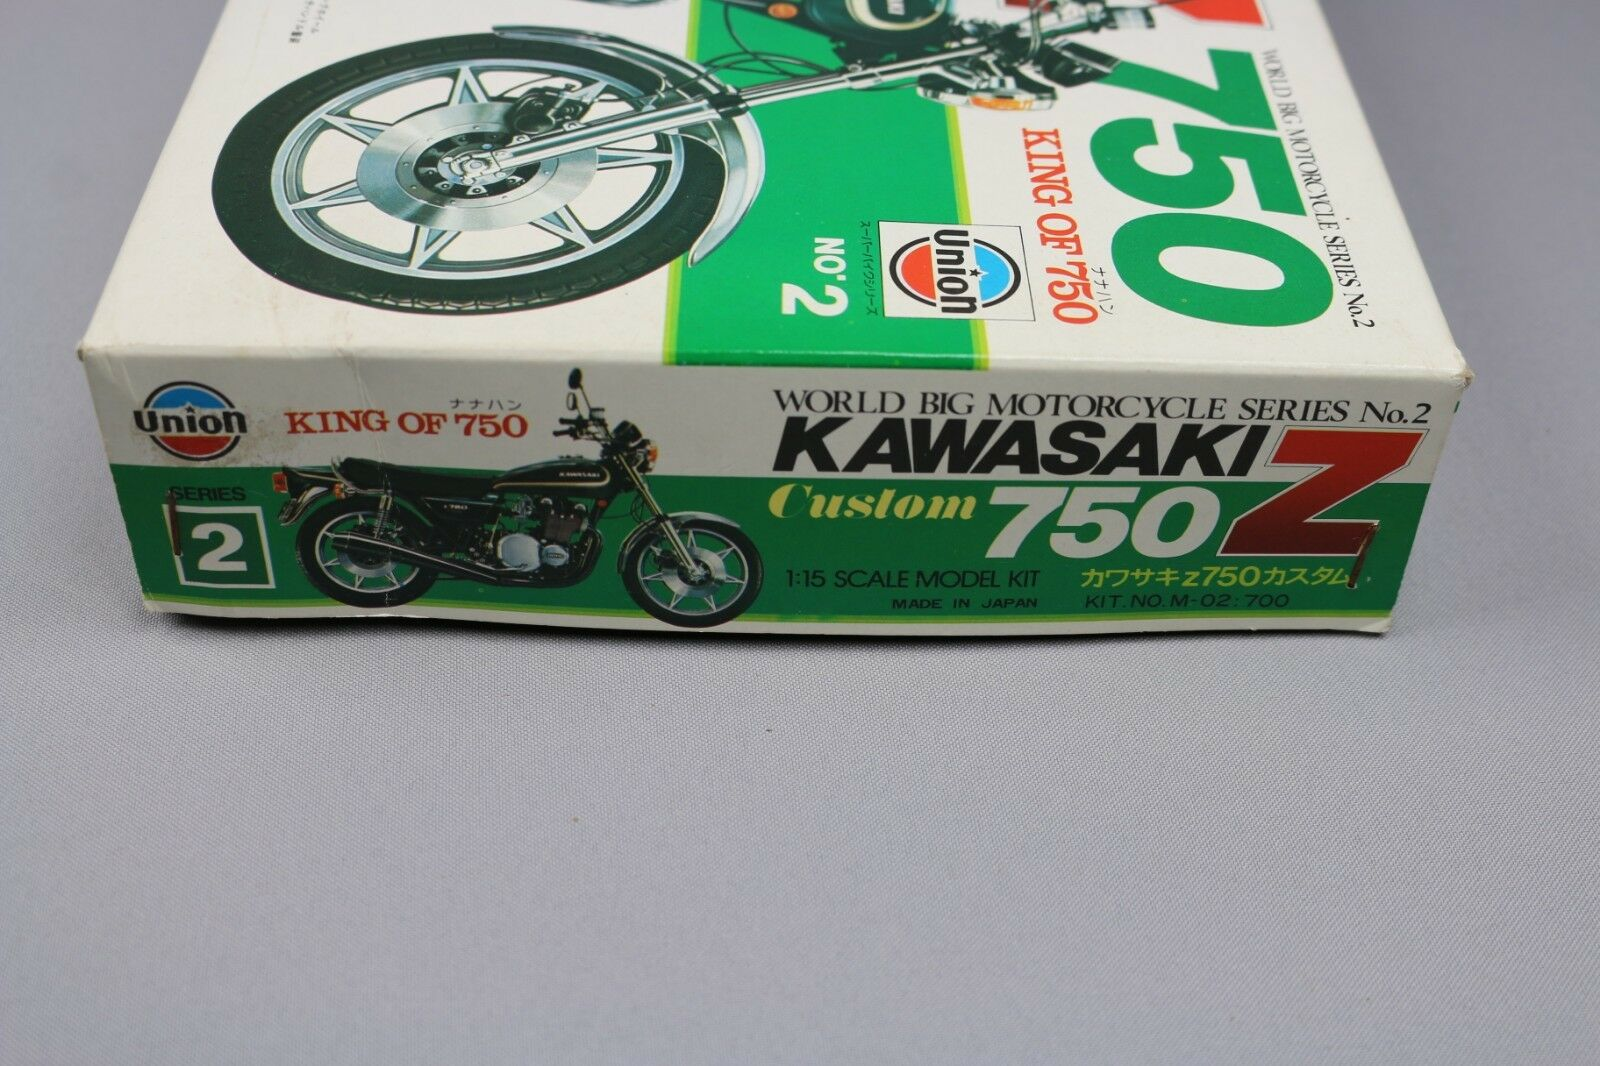 Zf1005 Union 1 15 15 15 Modellino Moto M-02   700 Costume Kawasaki Z750 Moto Serie fbec99